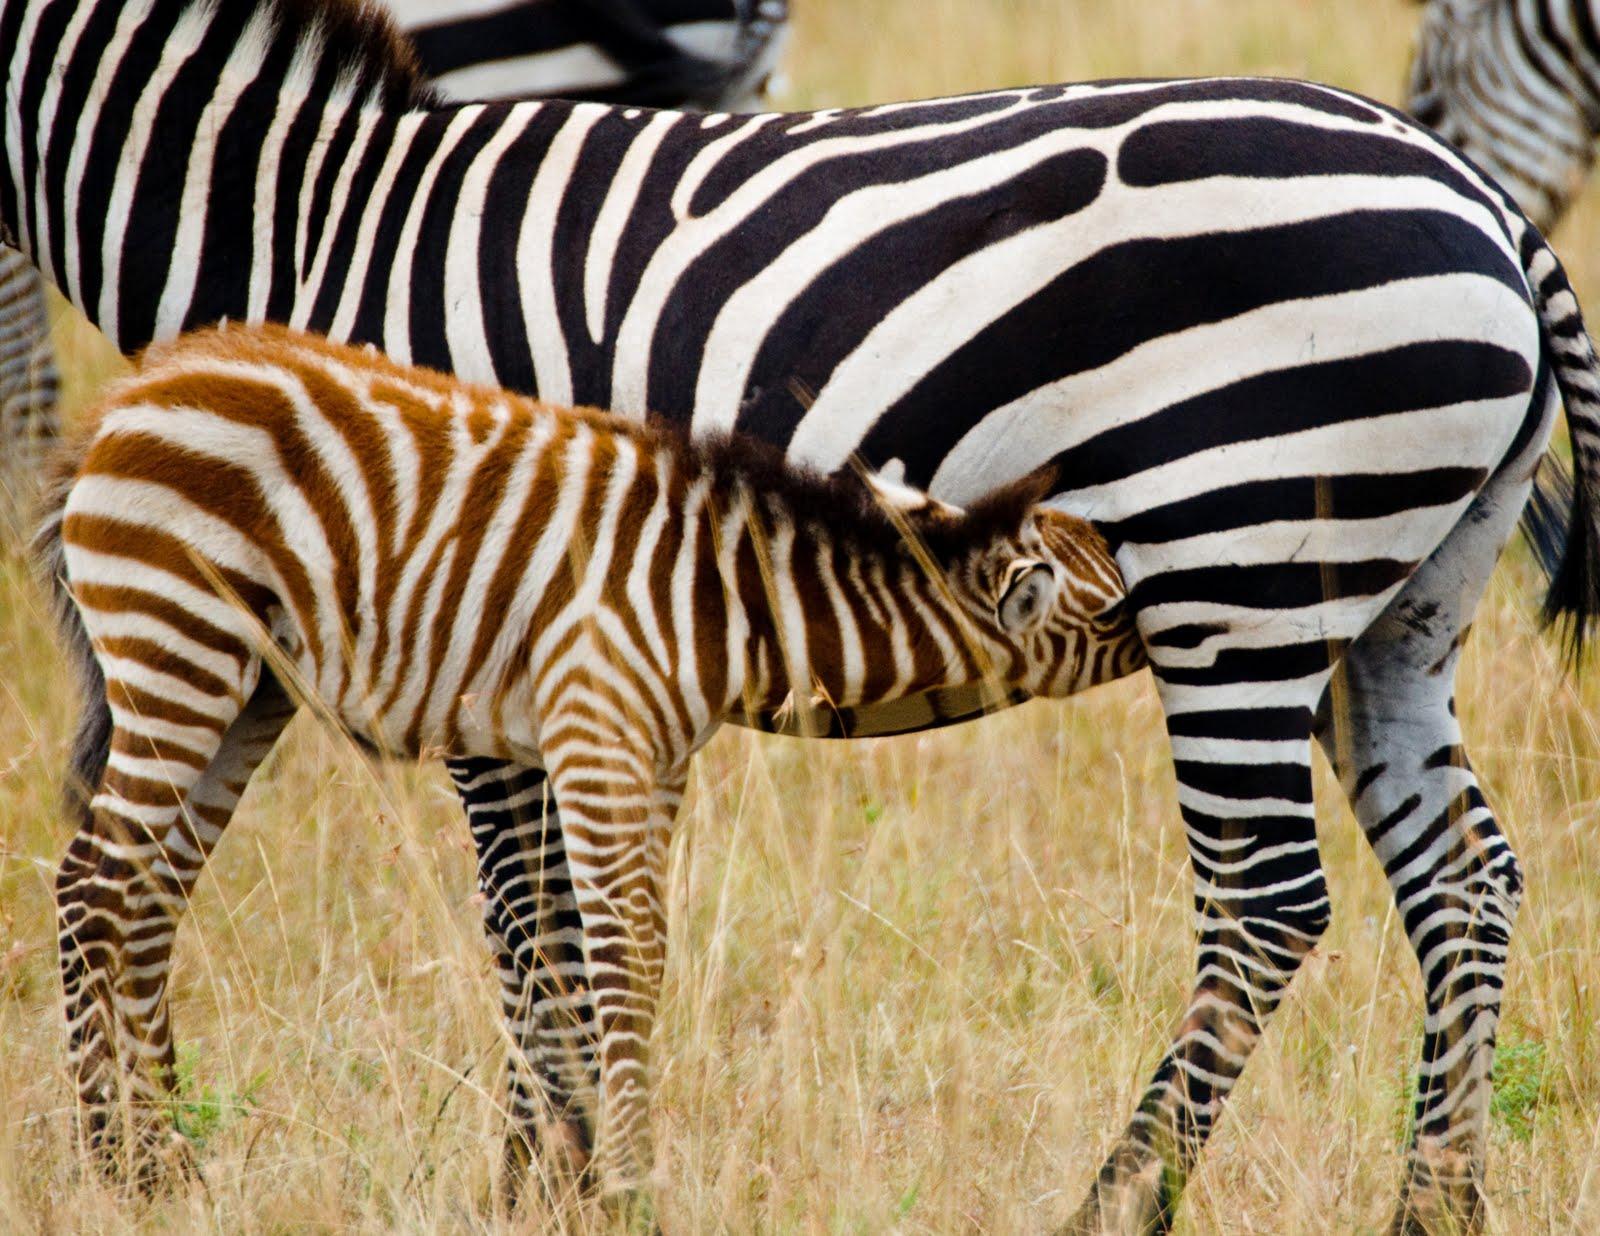 Baby Zebras In Africa The Baby Zebra ...